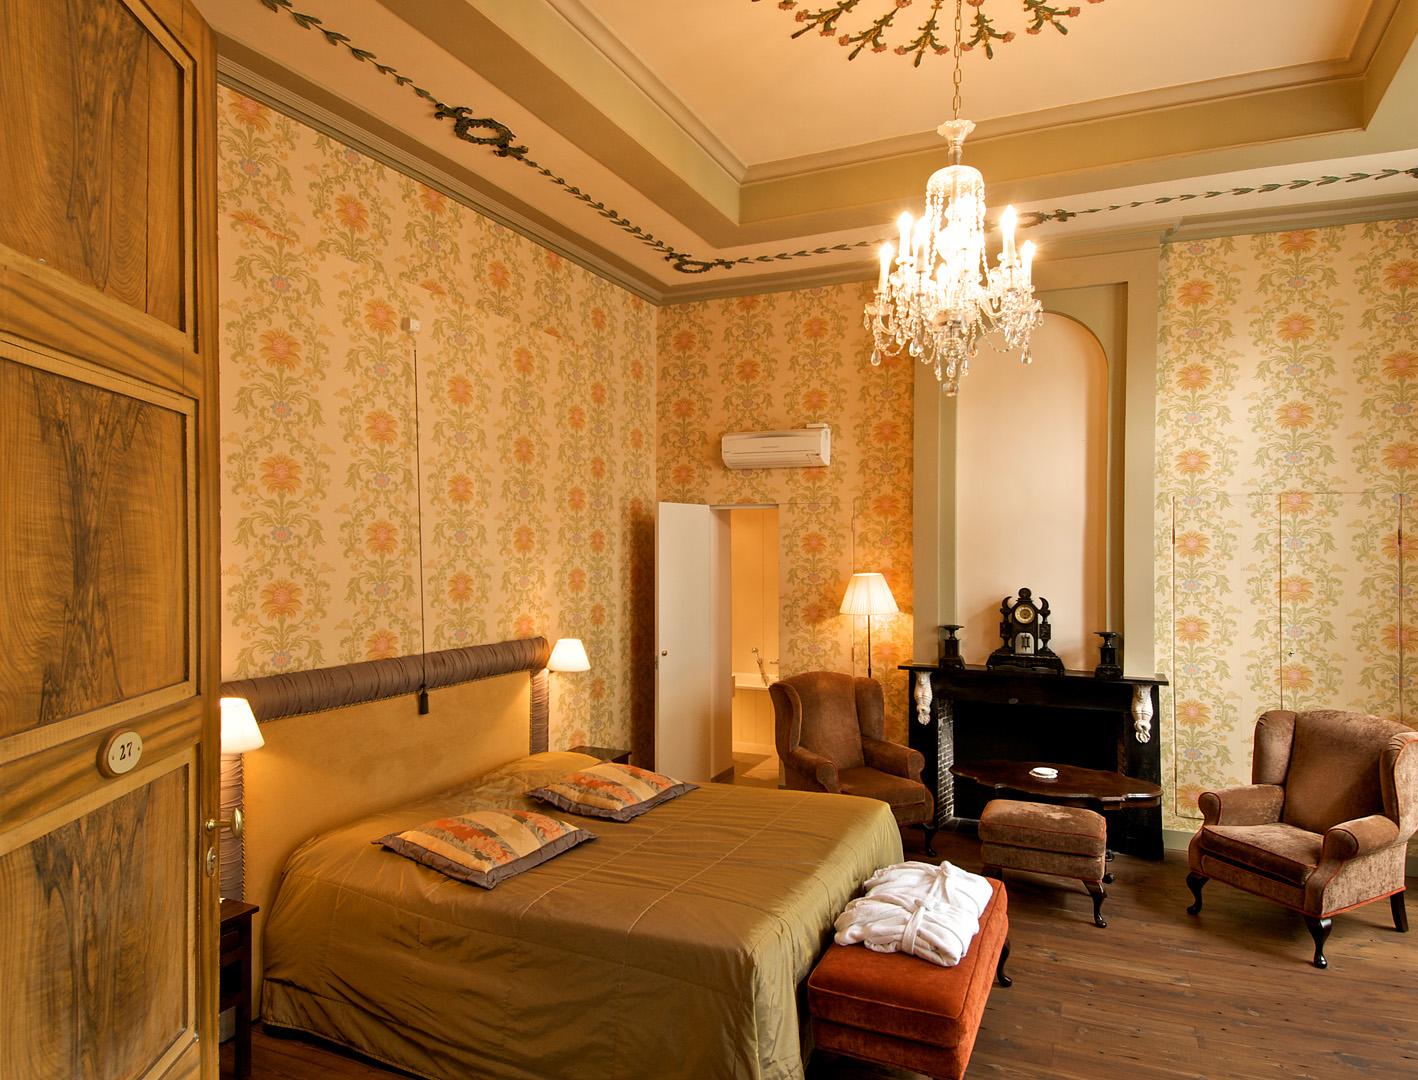 Junior suite hotel jan brito brugge belgium - Deco kamer onder dekking ...